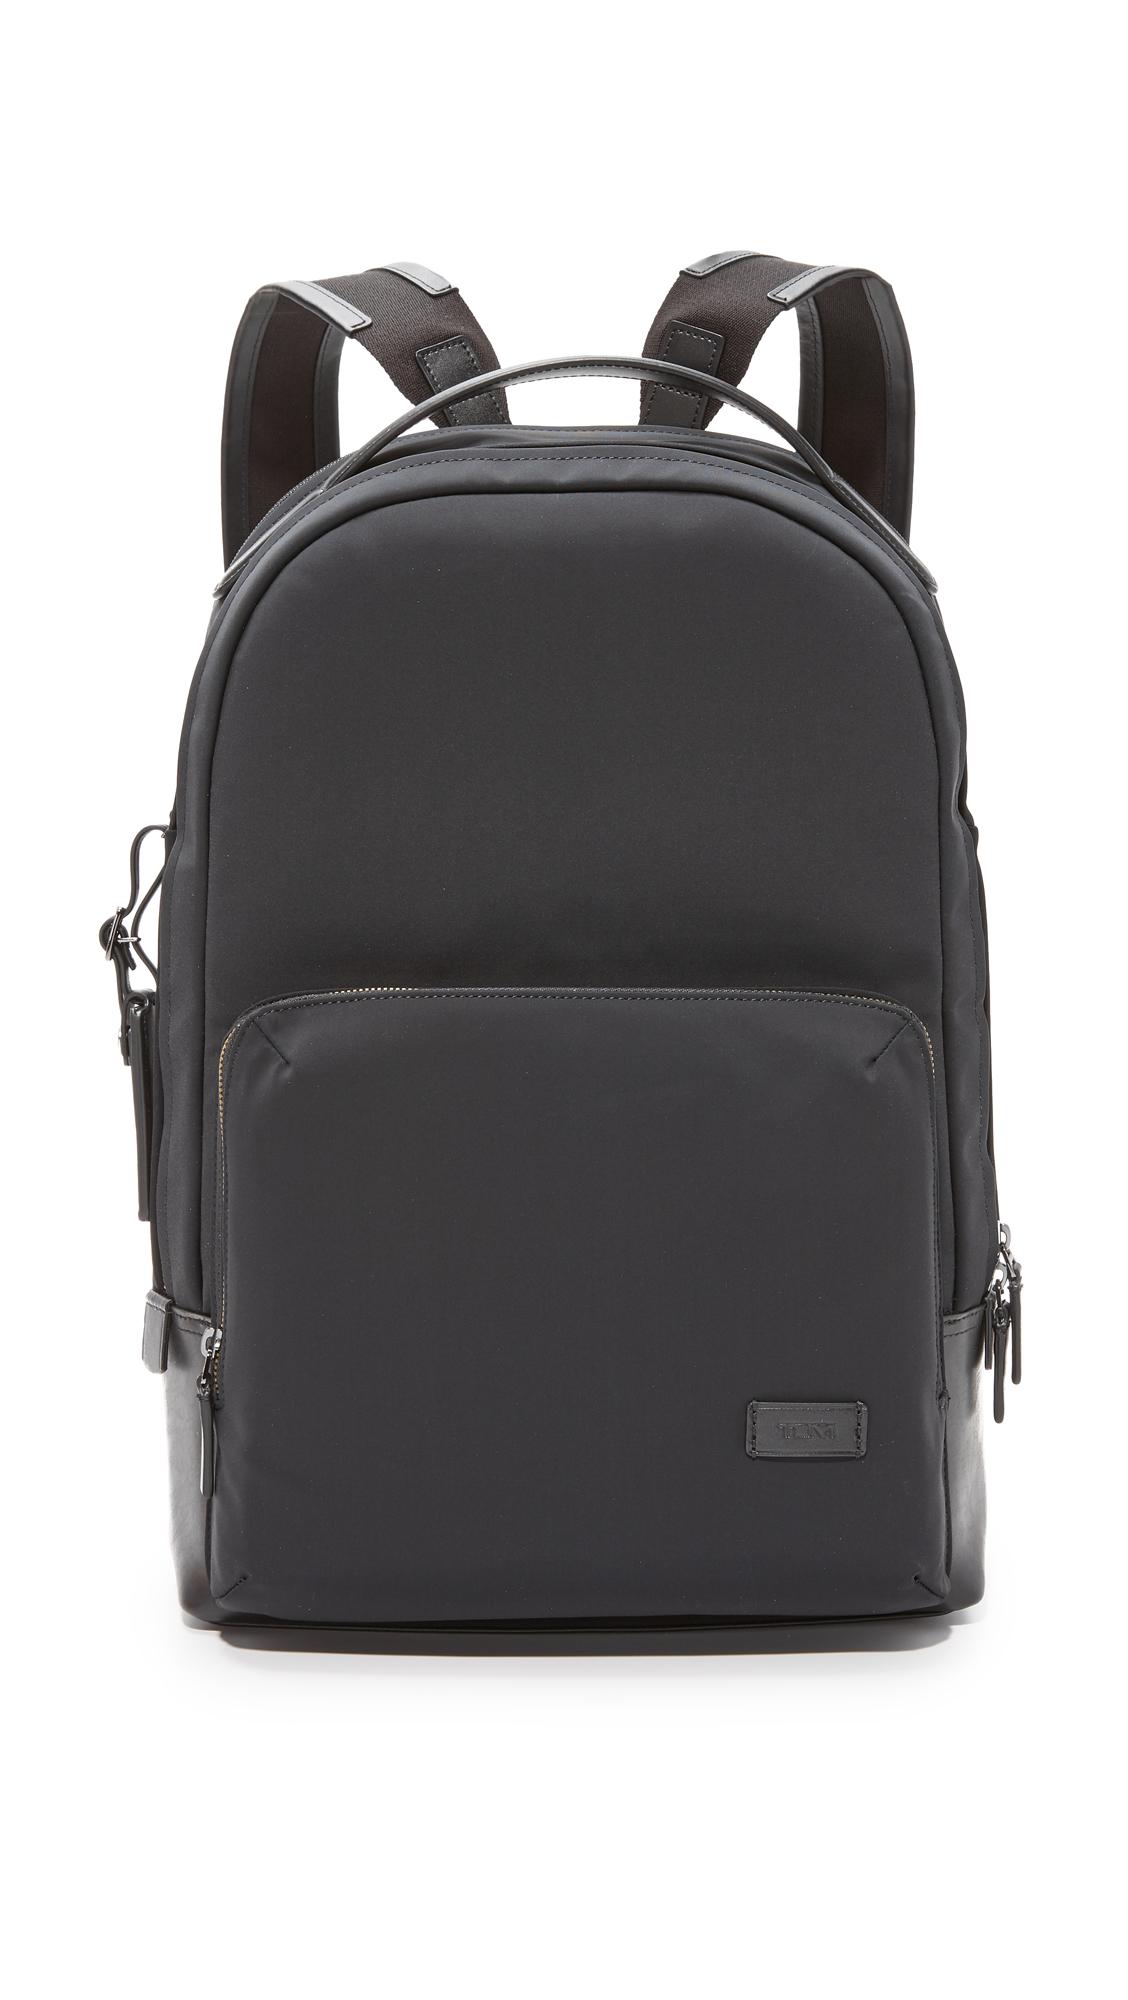 Mens Designer Bags Briefcases Backpacks Bag East Dane Shopper Tote Black Mc Sold